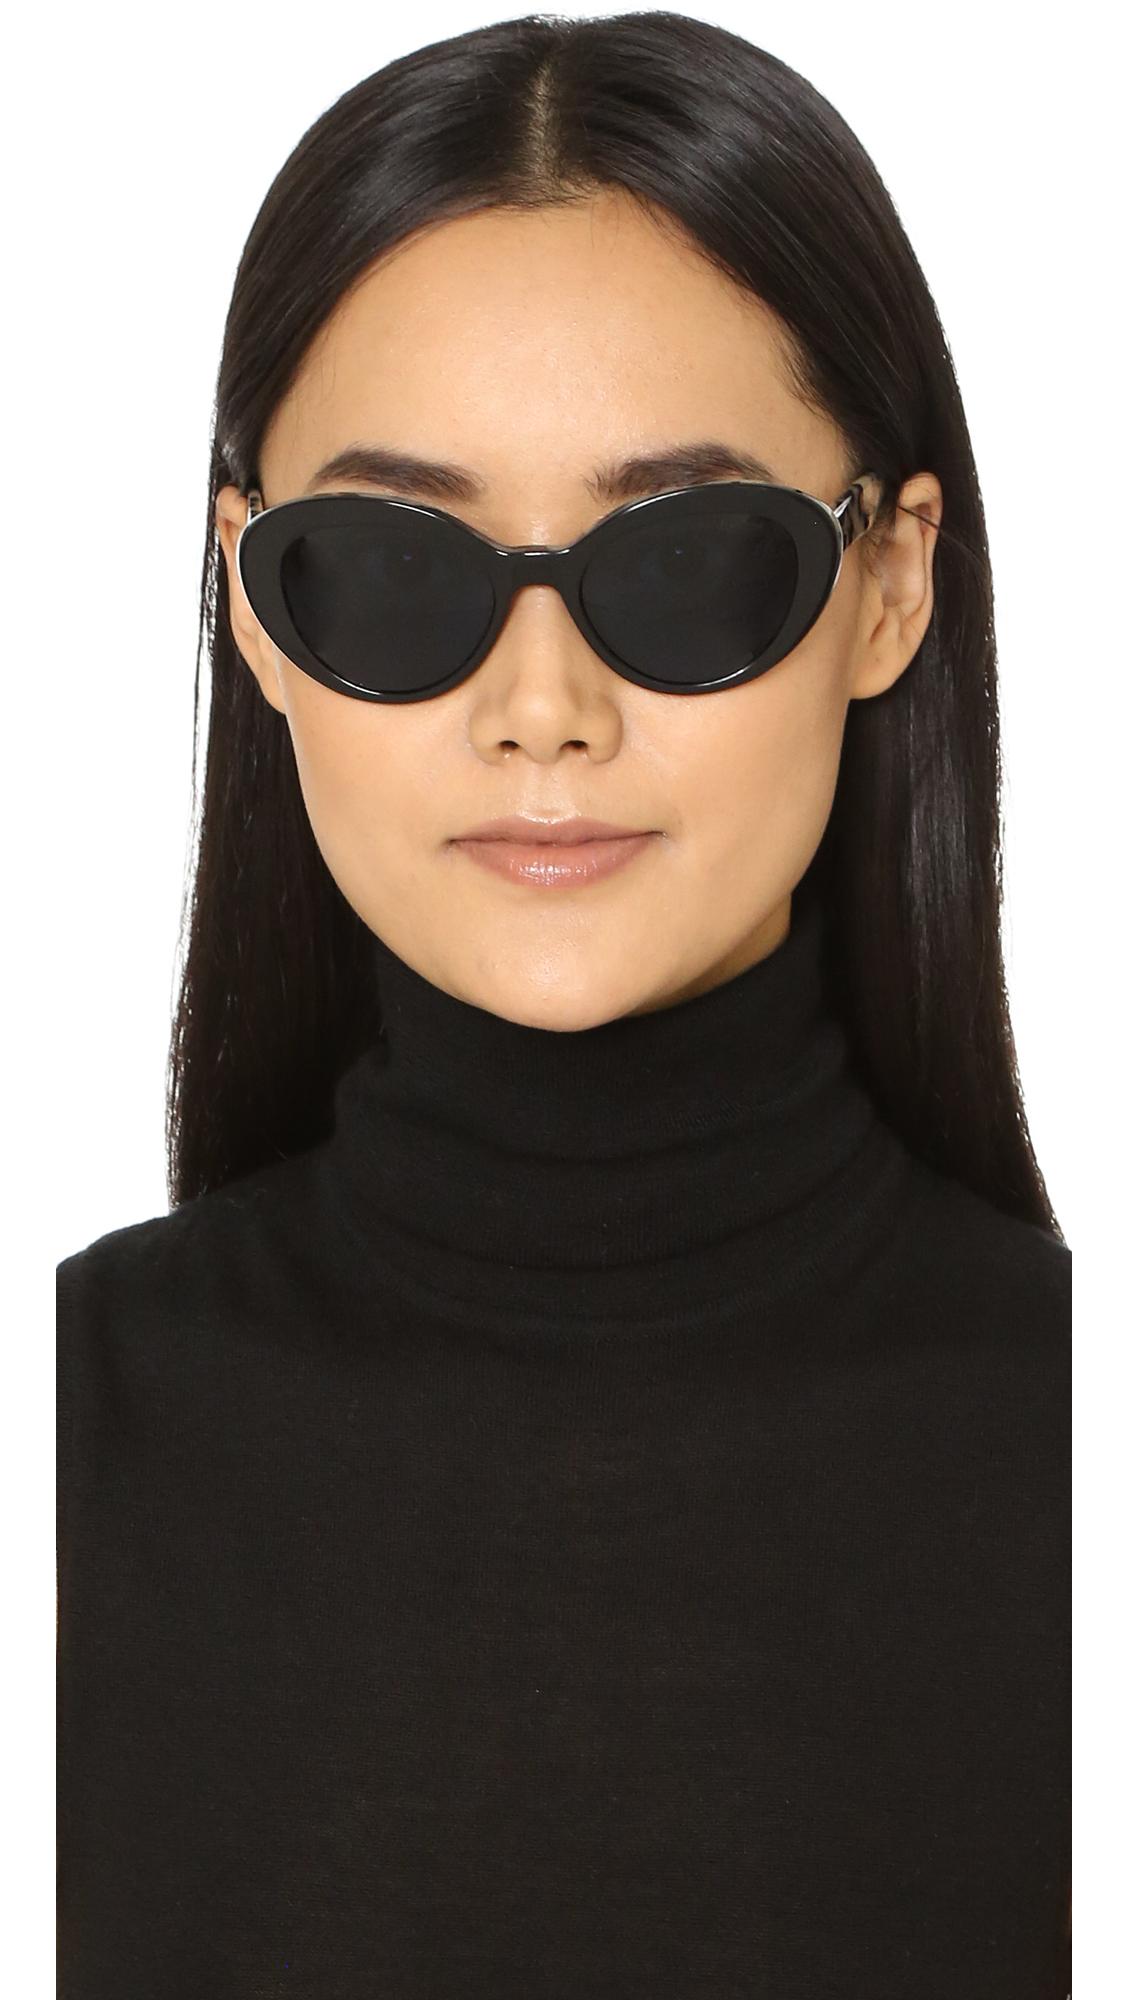 6f0e4c67e52 new arrivals prada sunglasses tortoise and the hair 5b701 21e90